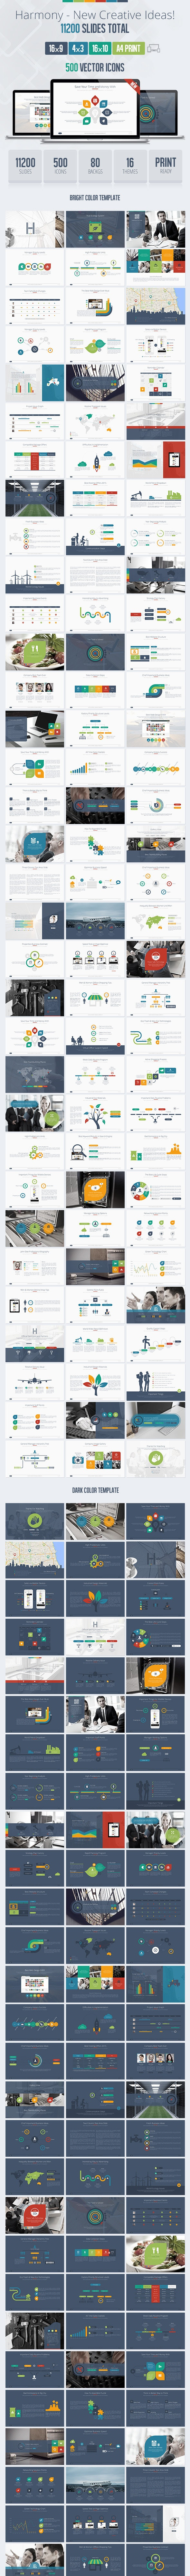 Harmony Usability Keynote Presentation Template - Business Keynote Templates